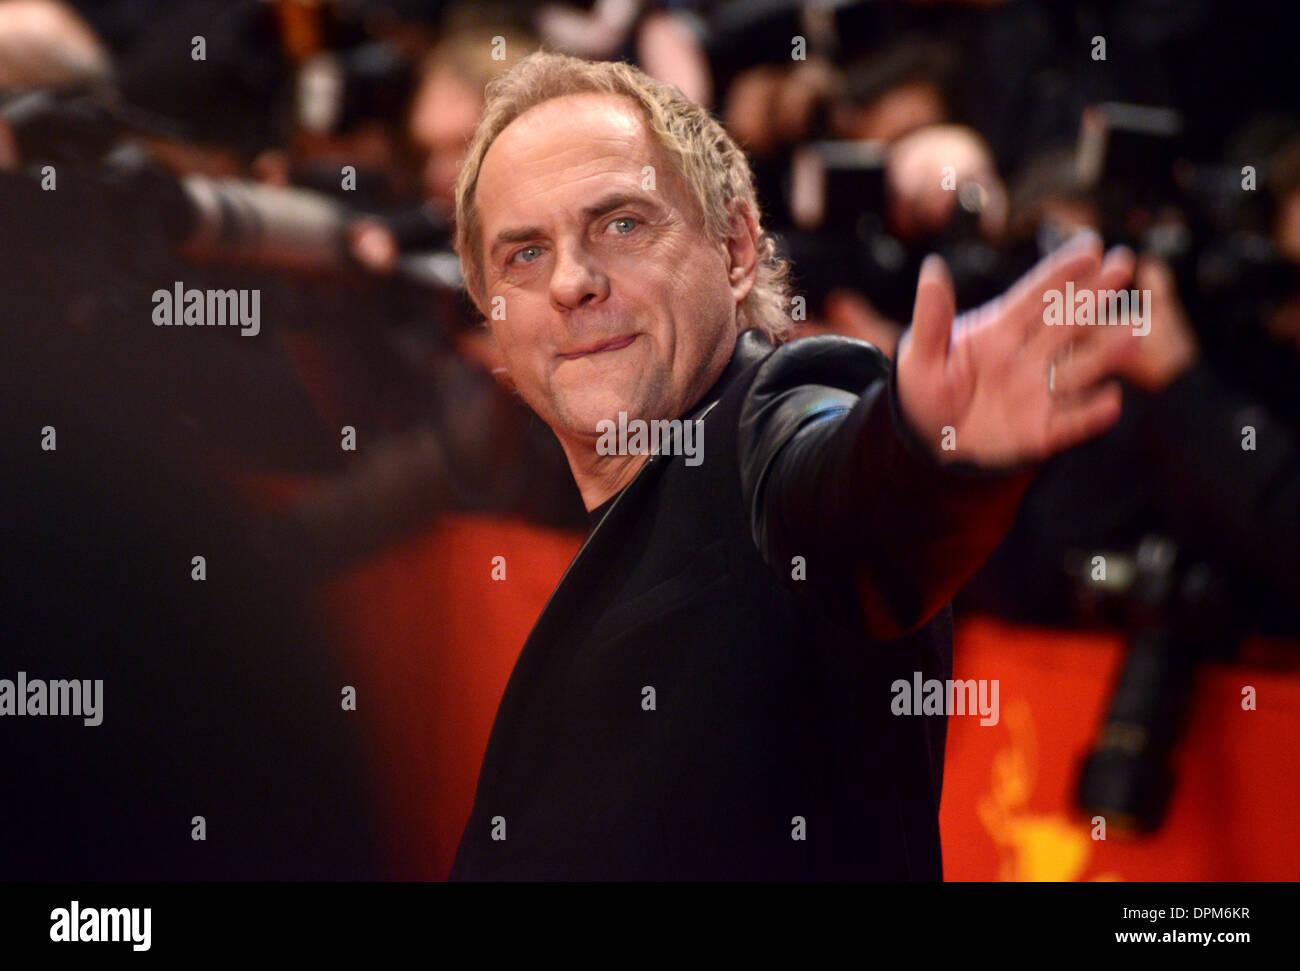 Uwe Ochsenknecht - 63rd Annual Berlinale International Film Festival, 'The Croods' Premiere, Berlin - February 15th 2013 - Stock Image